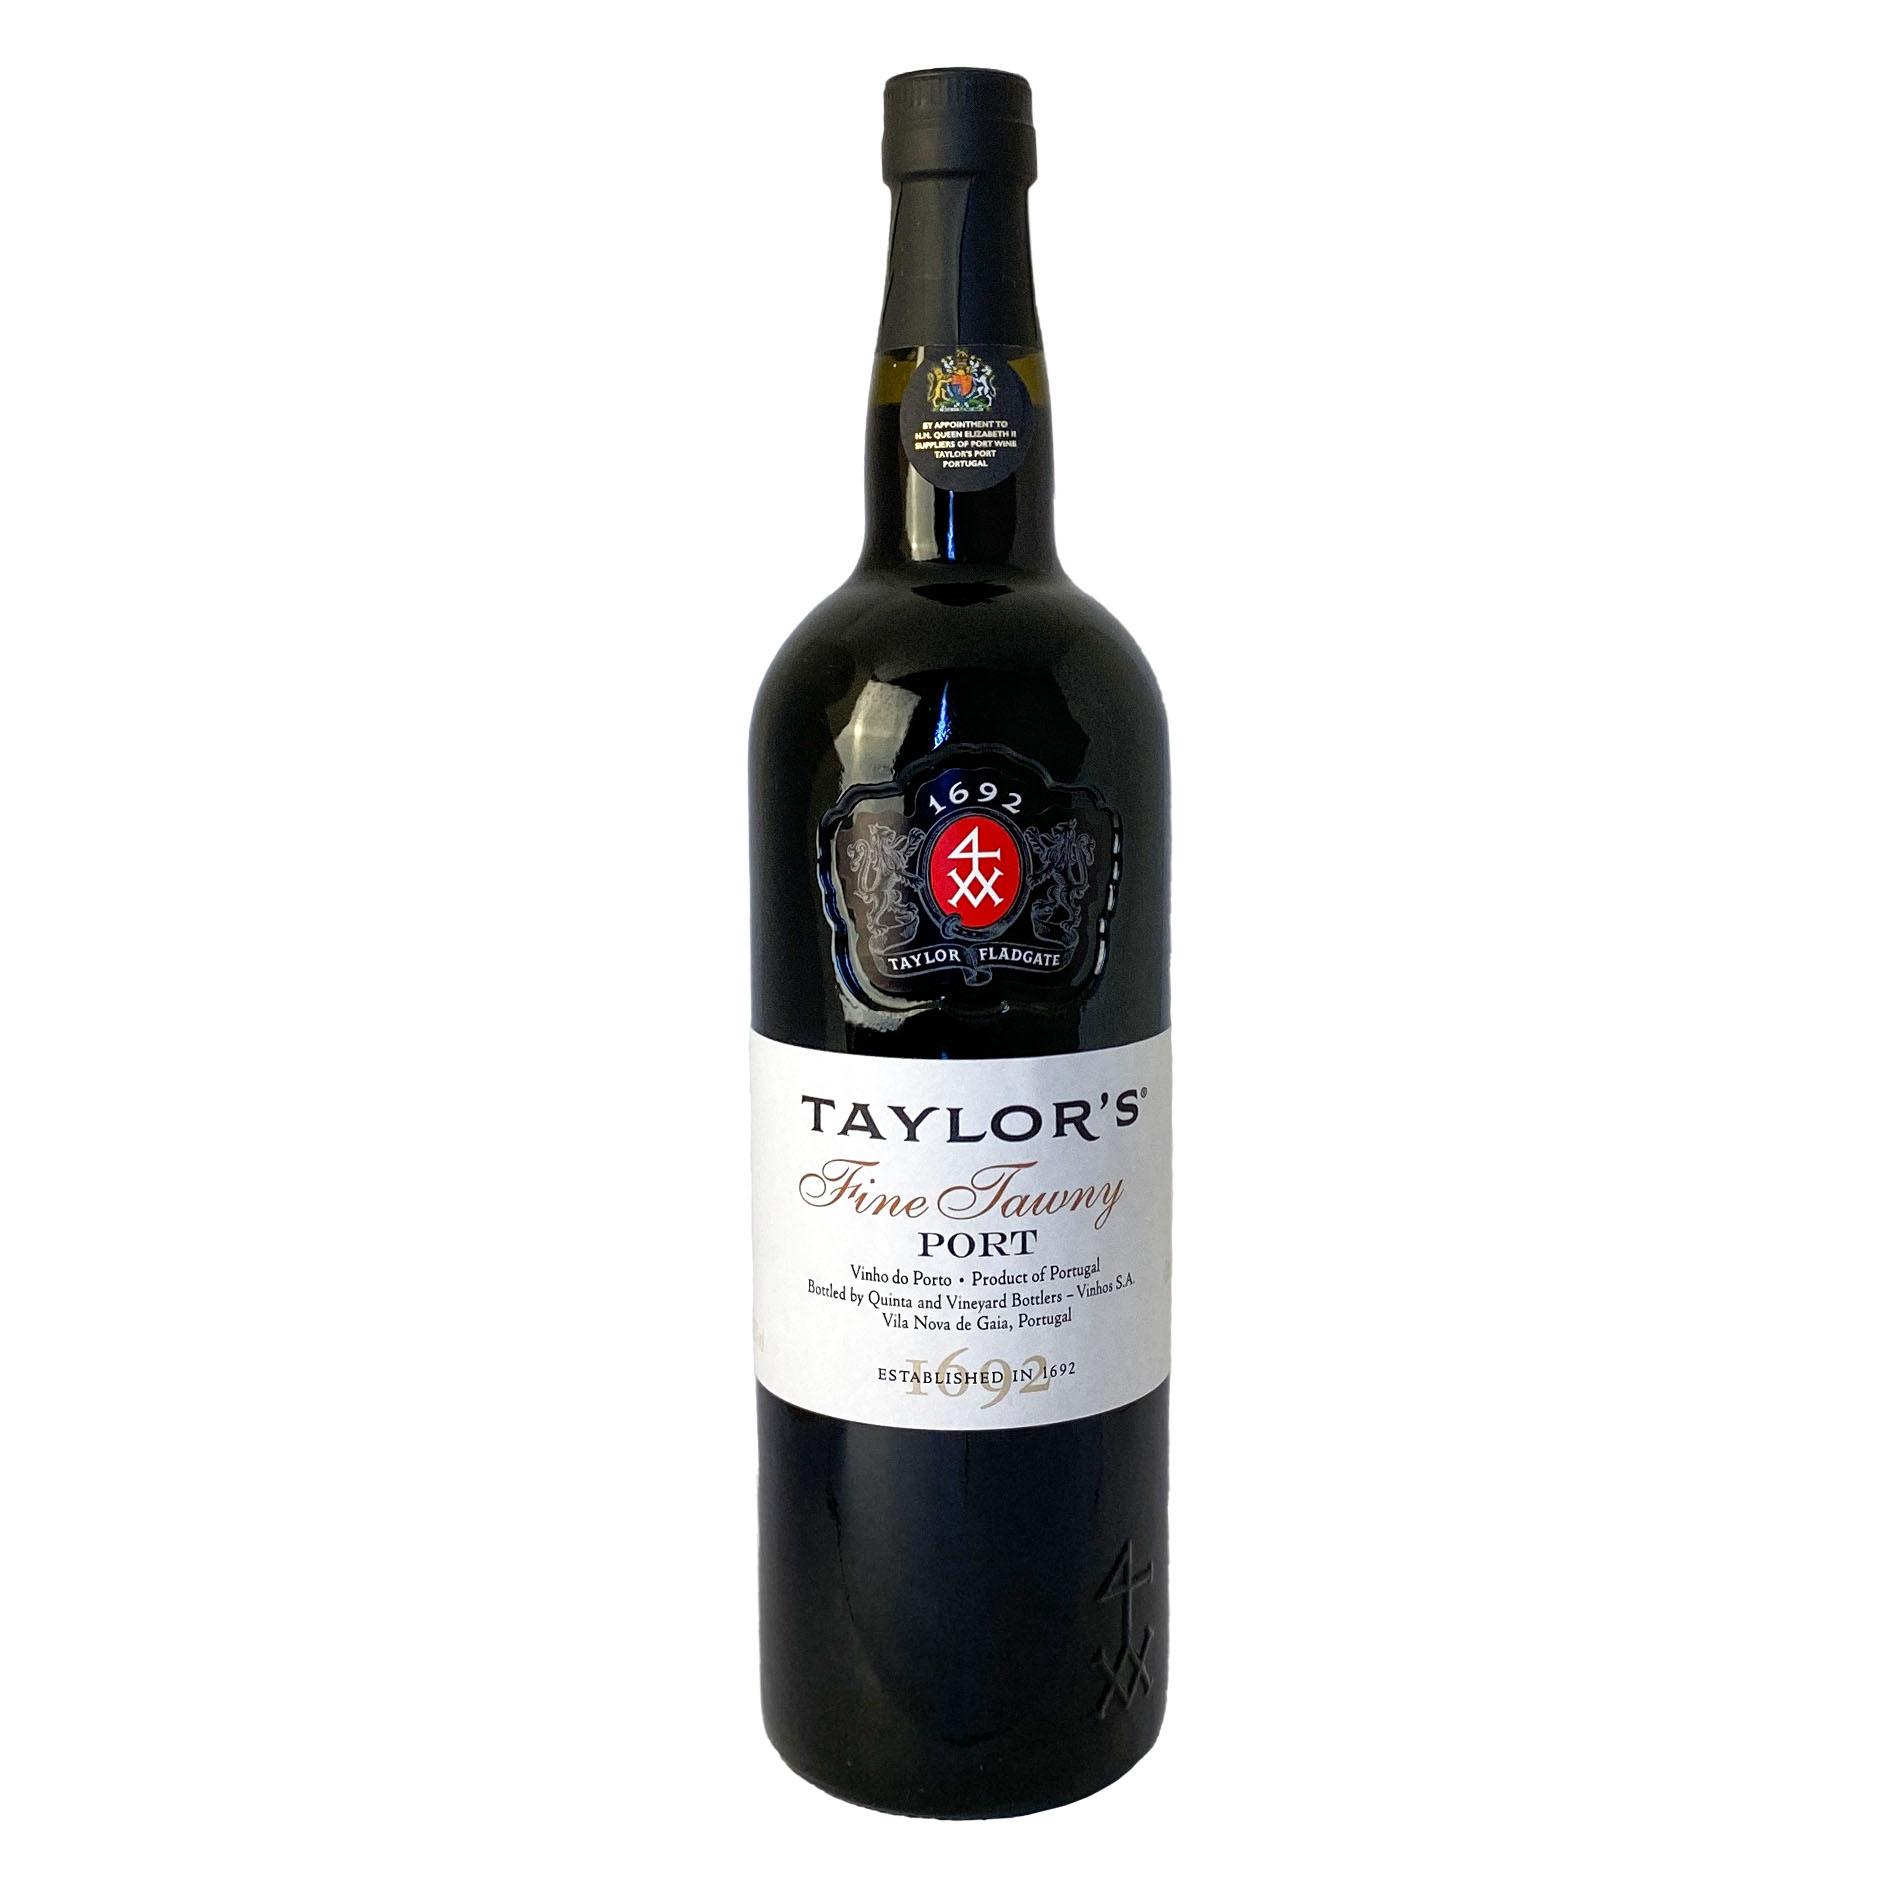 Taylors Porto Tawny  - Vinerize